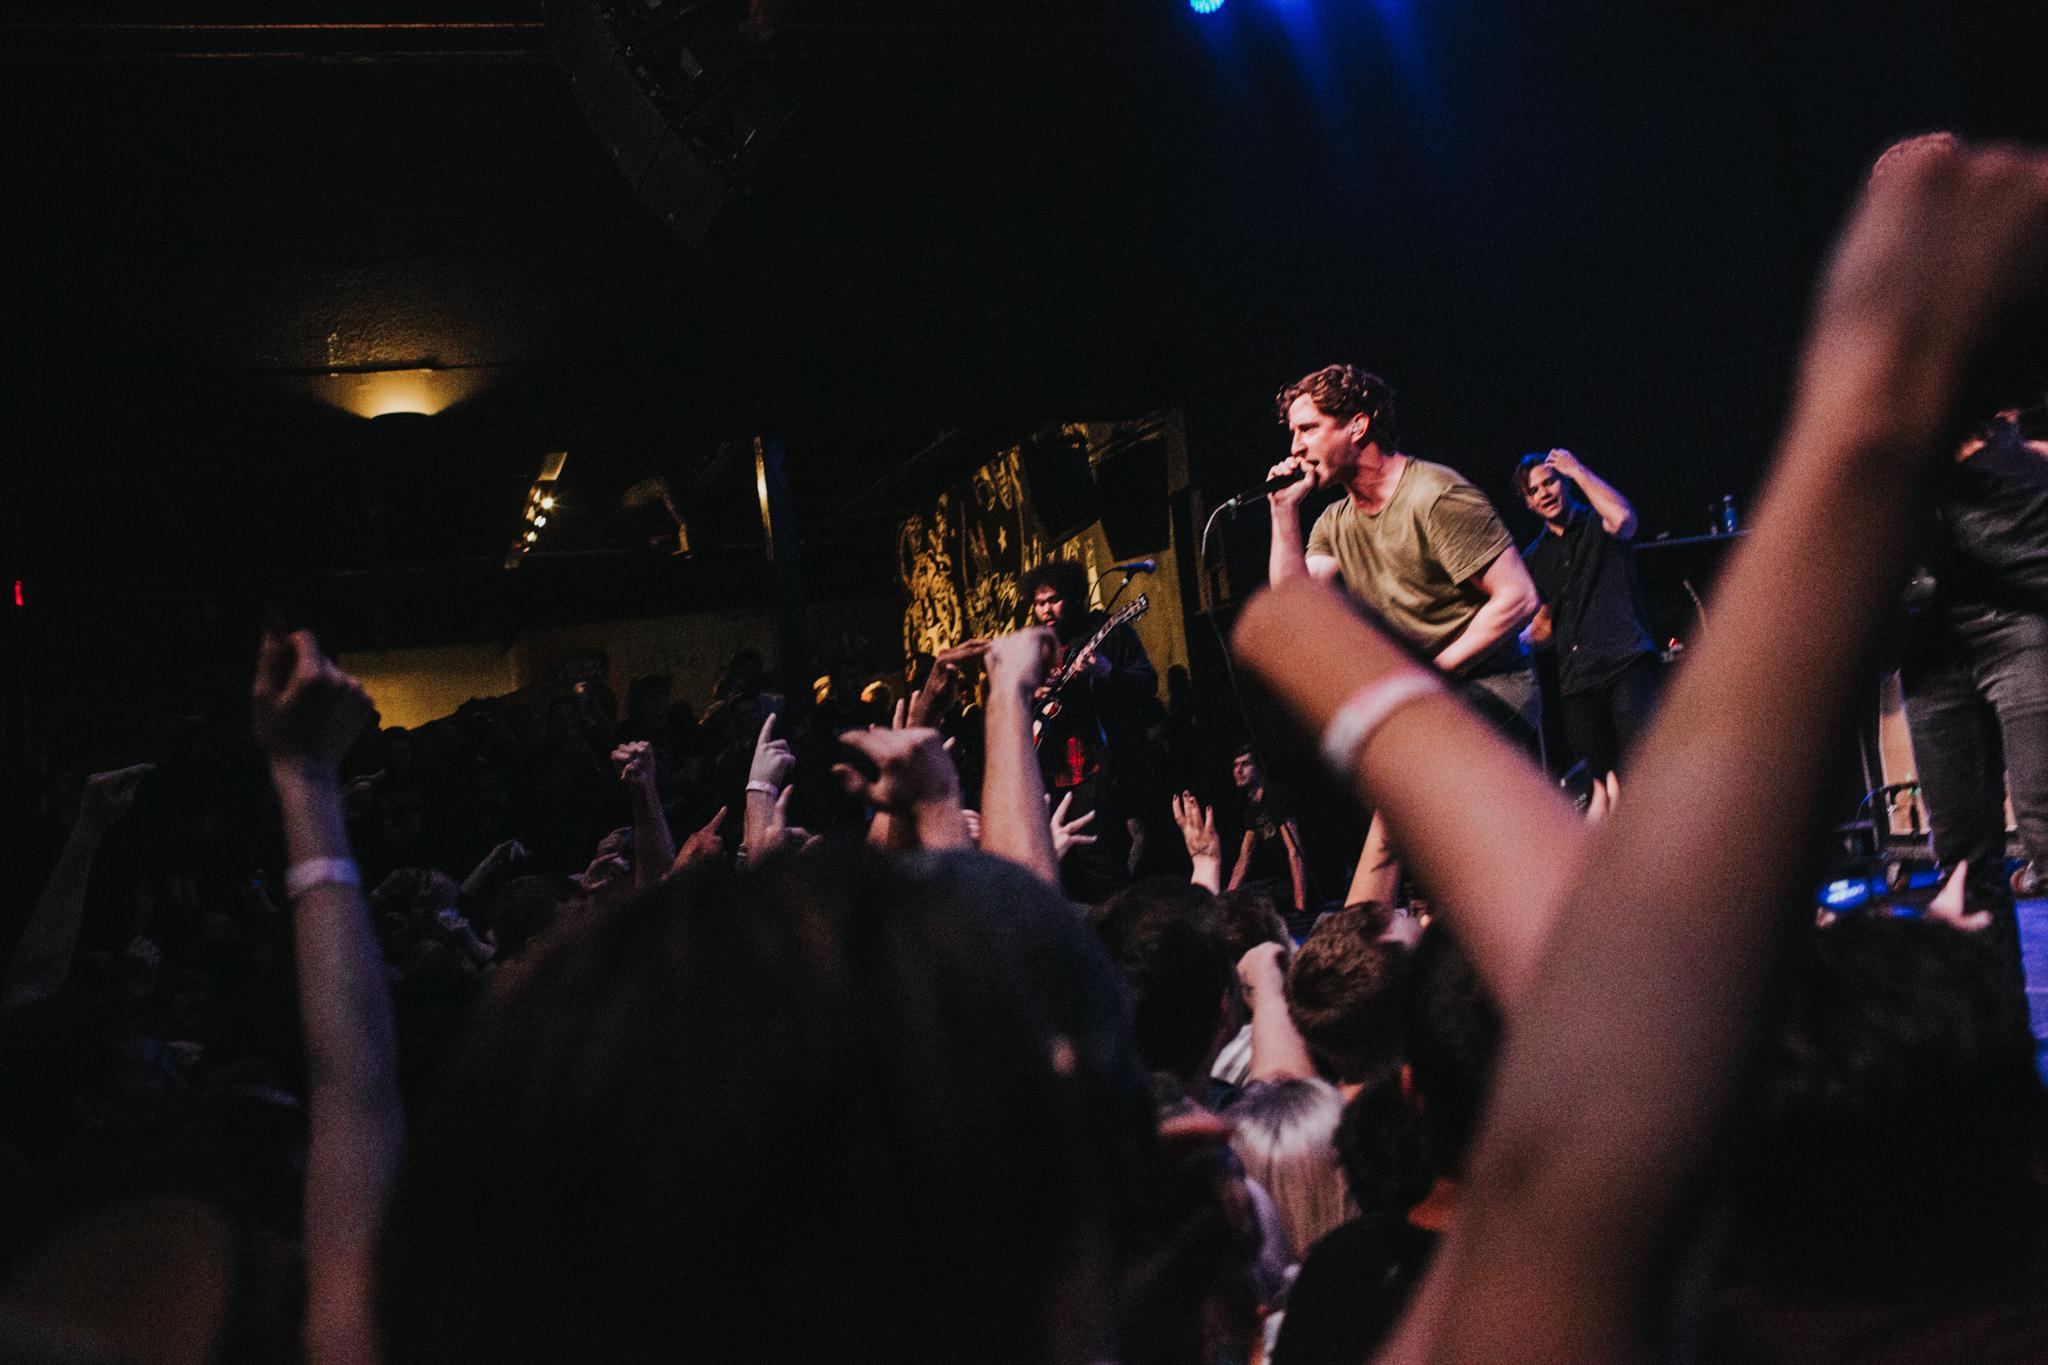 Lafferty Photo - Dance Gavin Dance 03.08.17-8223.jpg